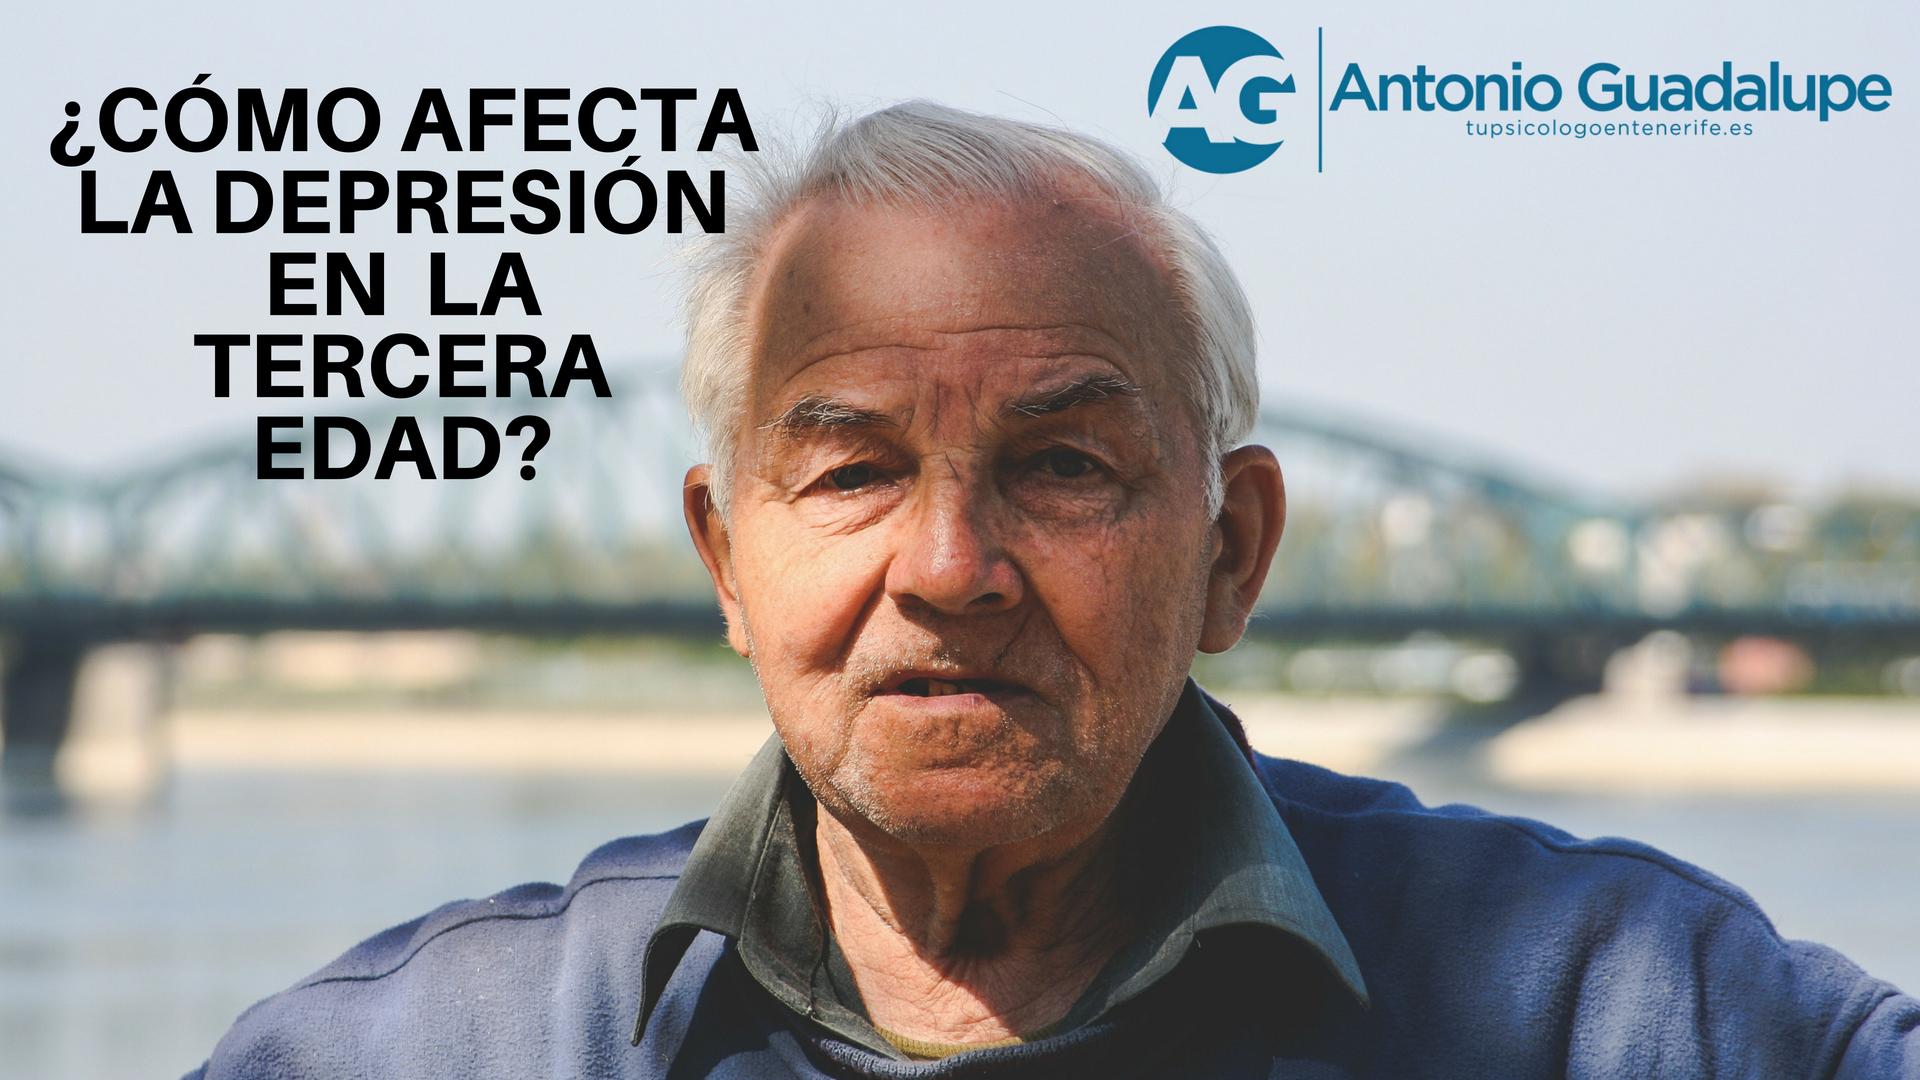 Depresión tercera edad? Descubre como te podemos ayudar